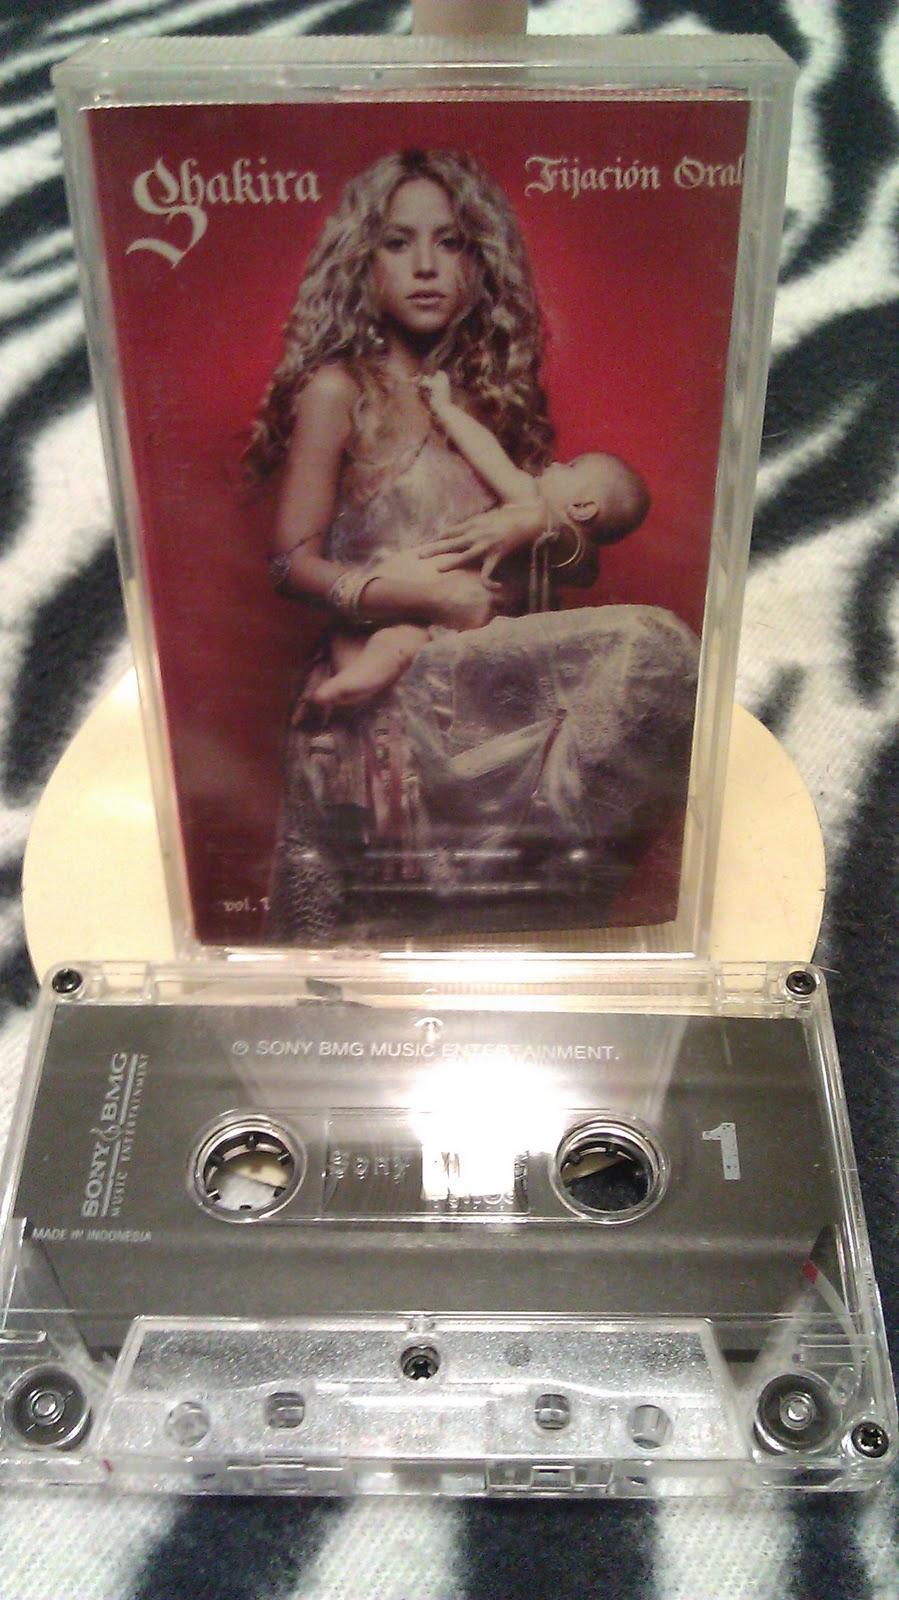 Álbum Shakira - Oral Fixation, Vol 2 - El Ojo